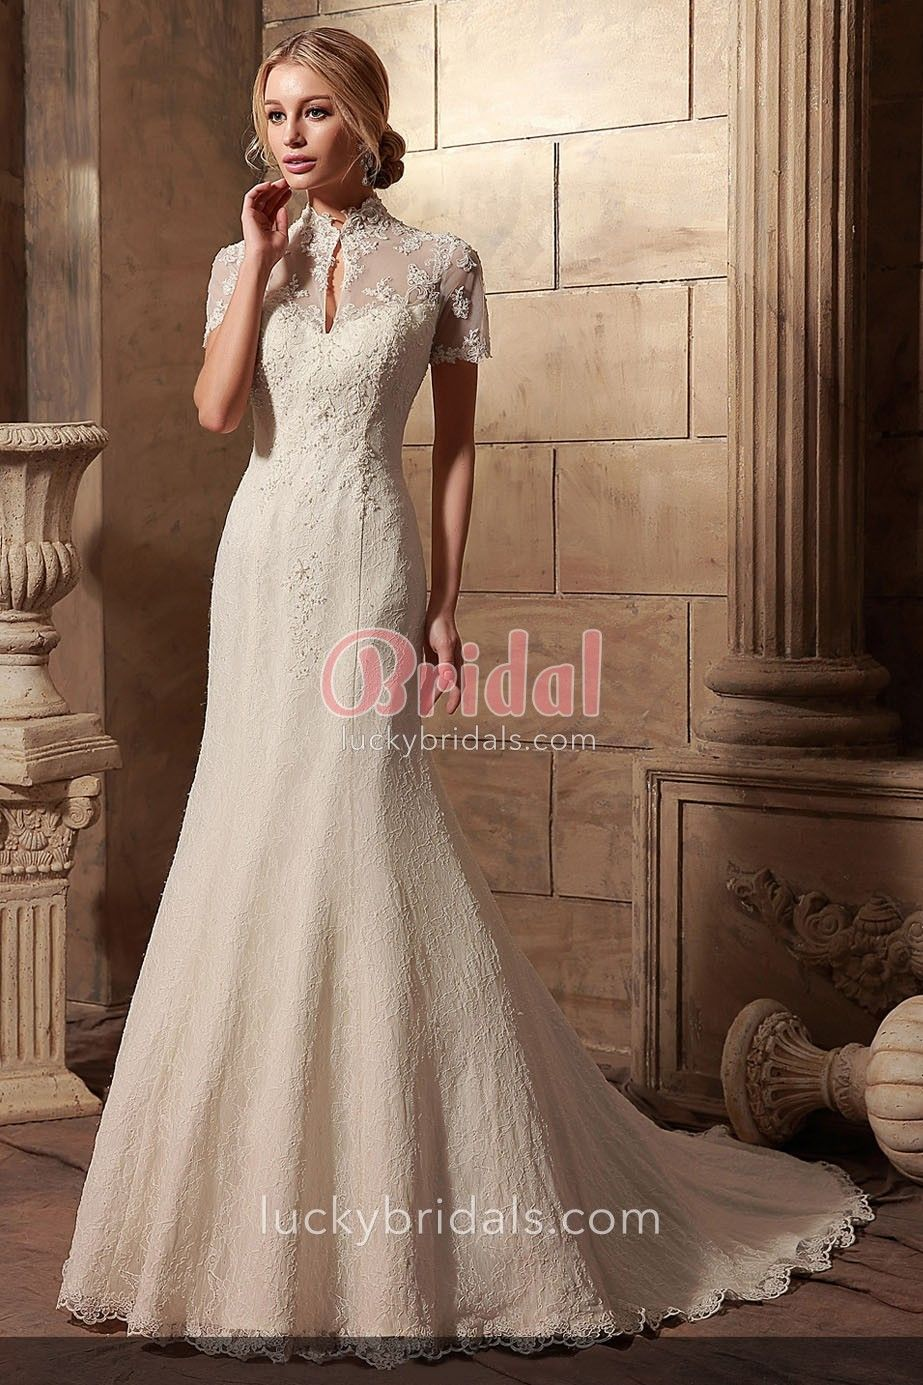 Site Currently Unavailable High Collar Wedding Dress Wedding Gowns Vintage Wedding Dress Types [ 1385 x 923 Pixel ]